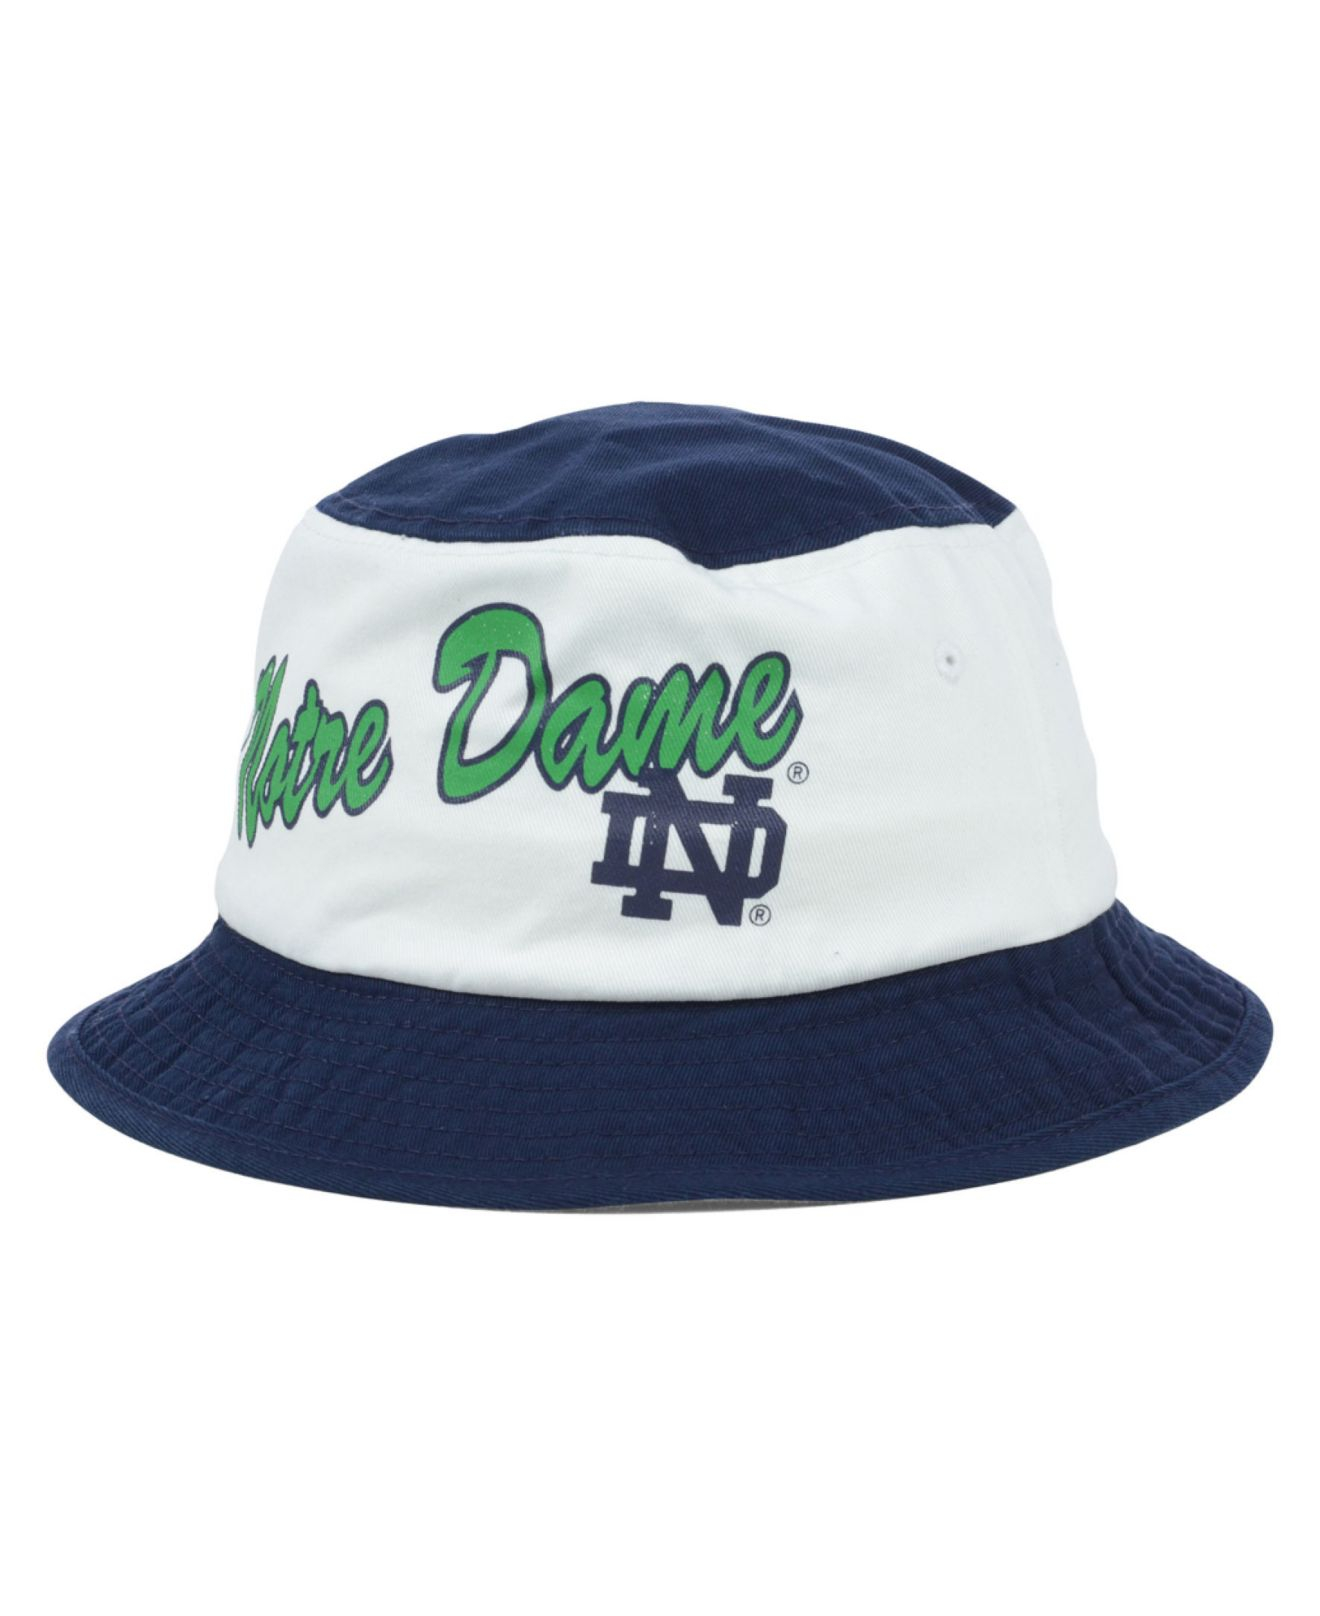 super popular a9ca7 51985 ... shop lyst adidas notre dame fighting irish script bucket hat in blue  c86f8 bca4b